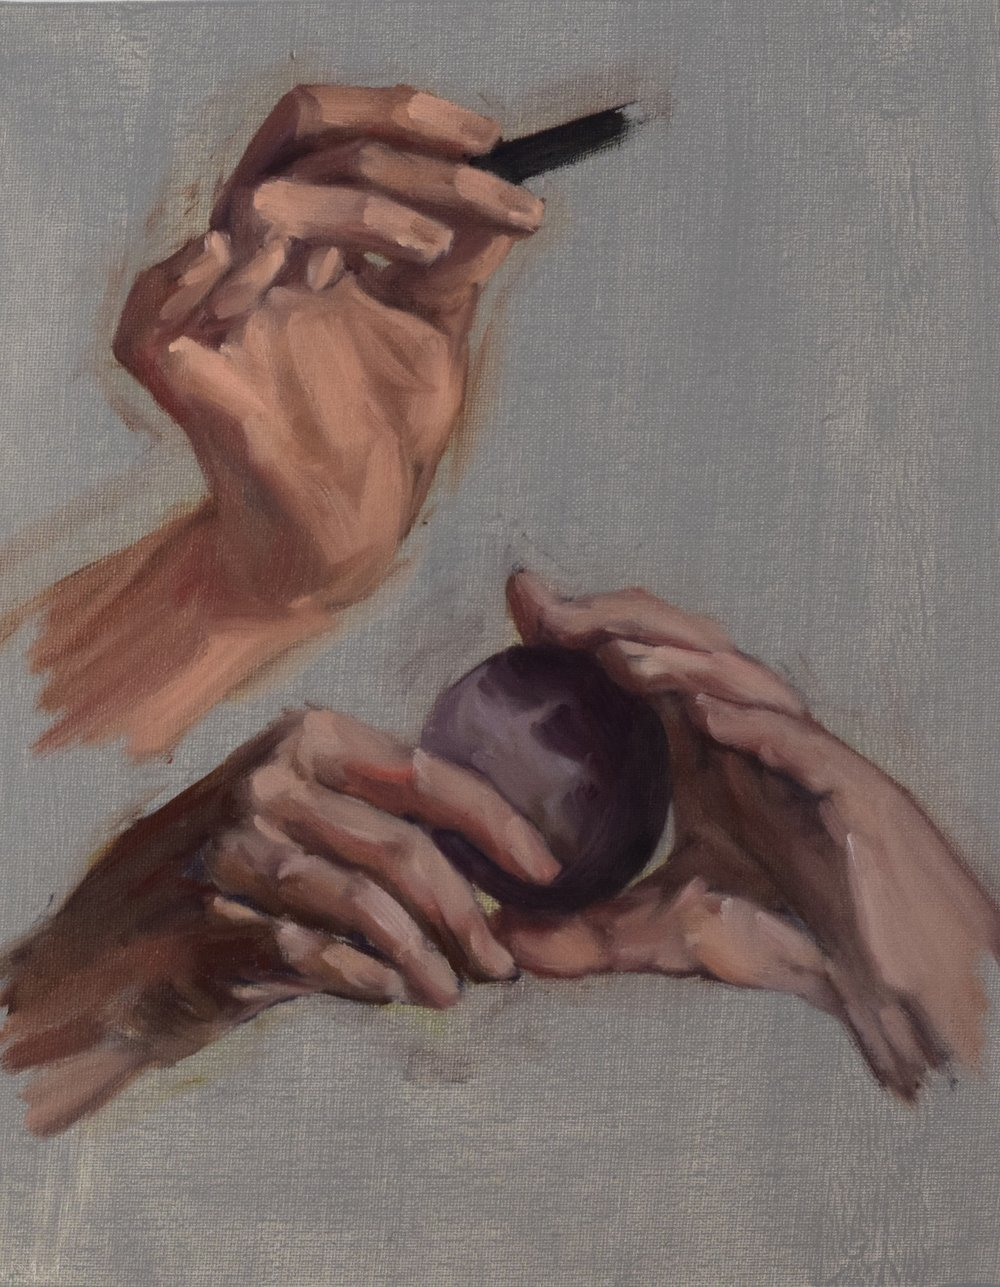 2018.Hands2.LR.JPG